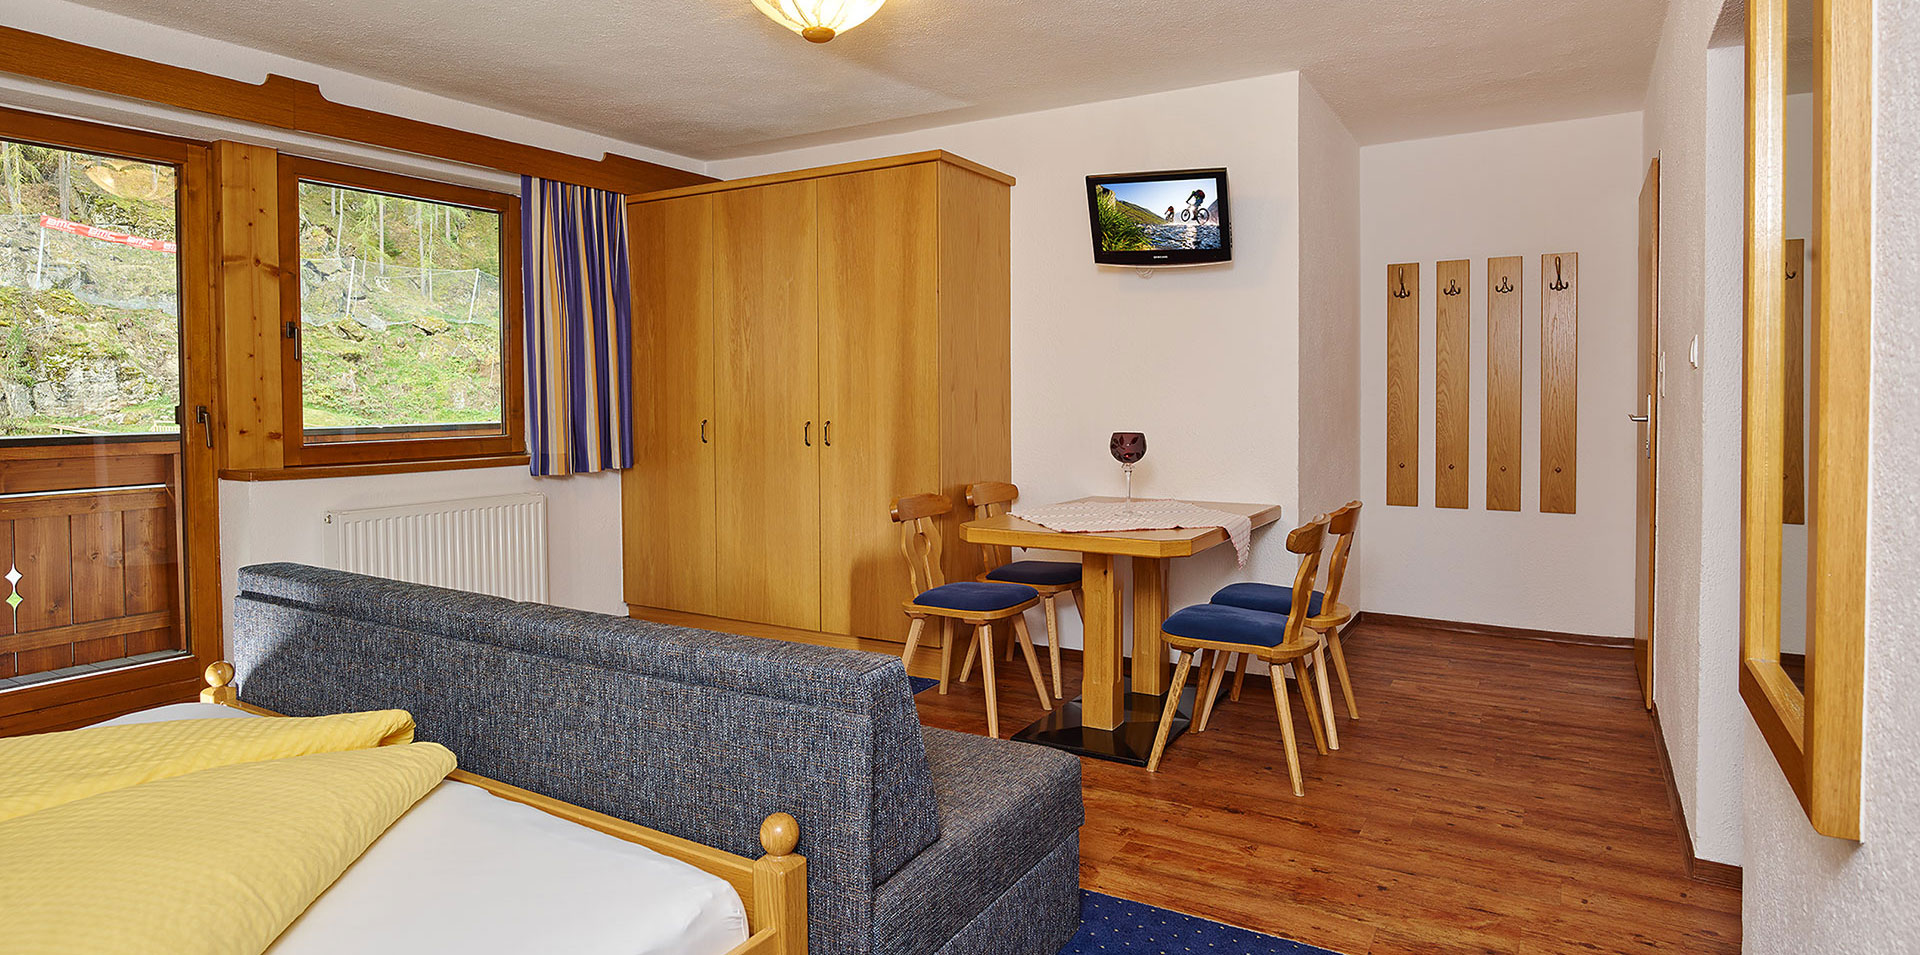 apart05-wohnraum